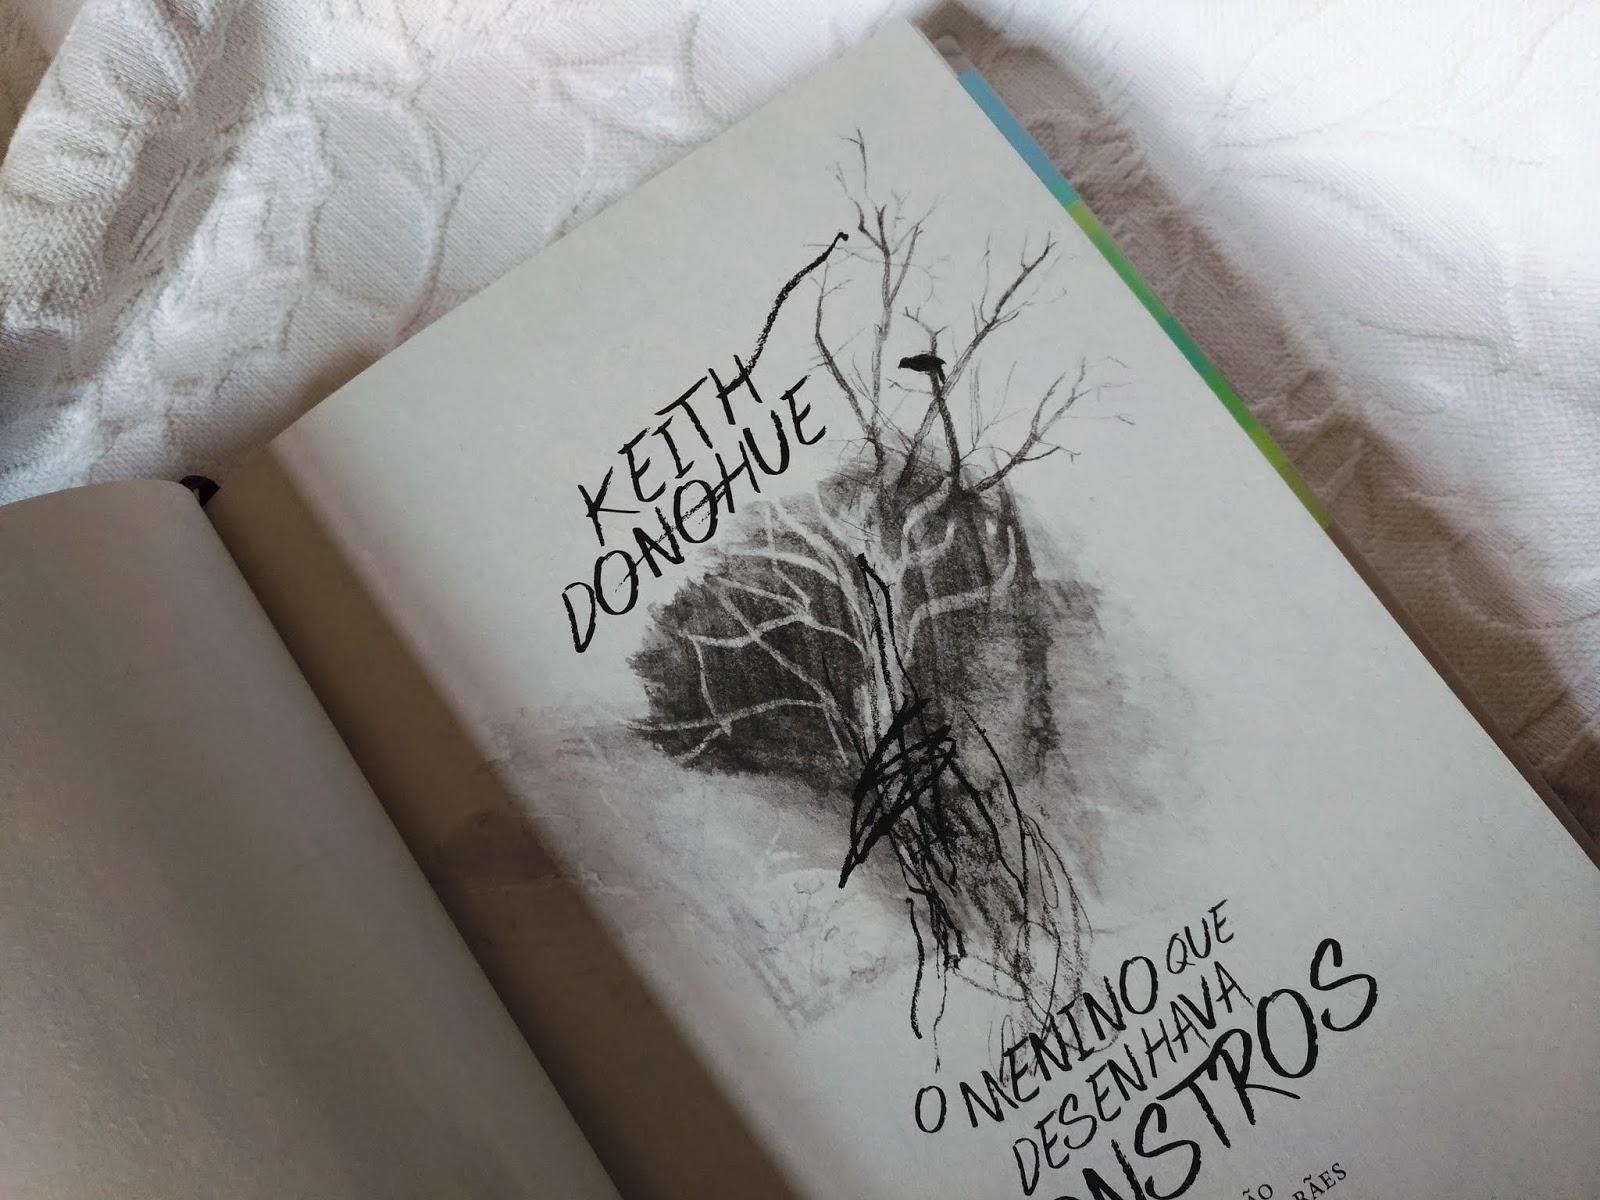 DICA DE LEITURA: O MENINO QUE DESENHAVA MONSTROS - KEITH DONOHUE